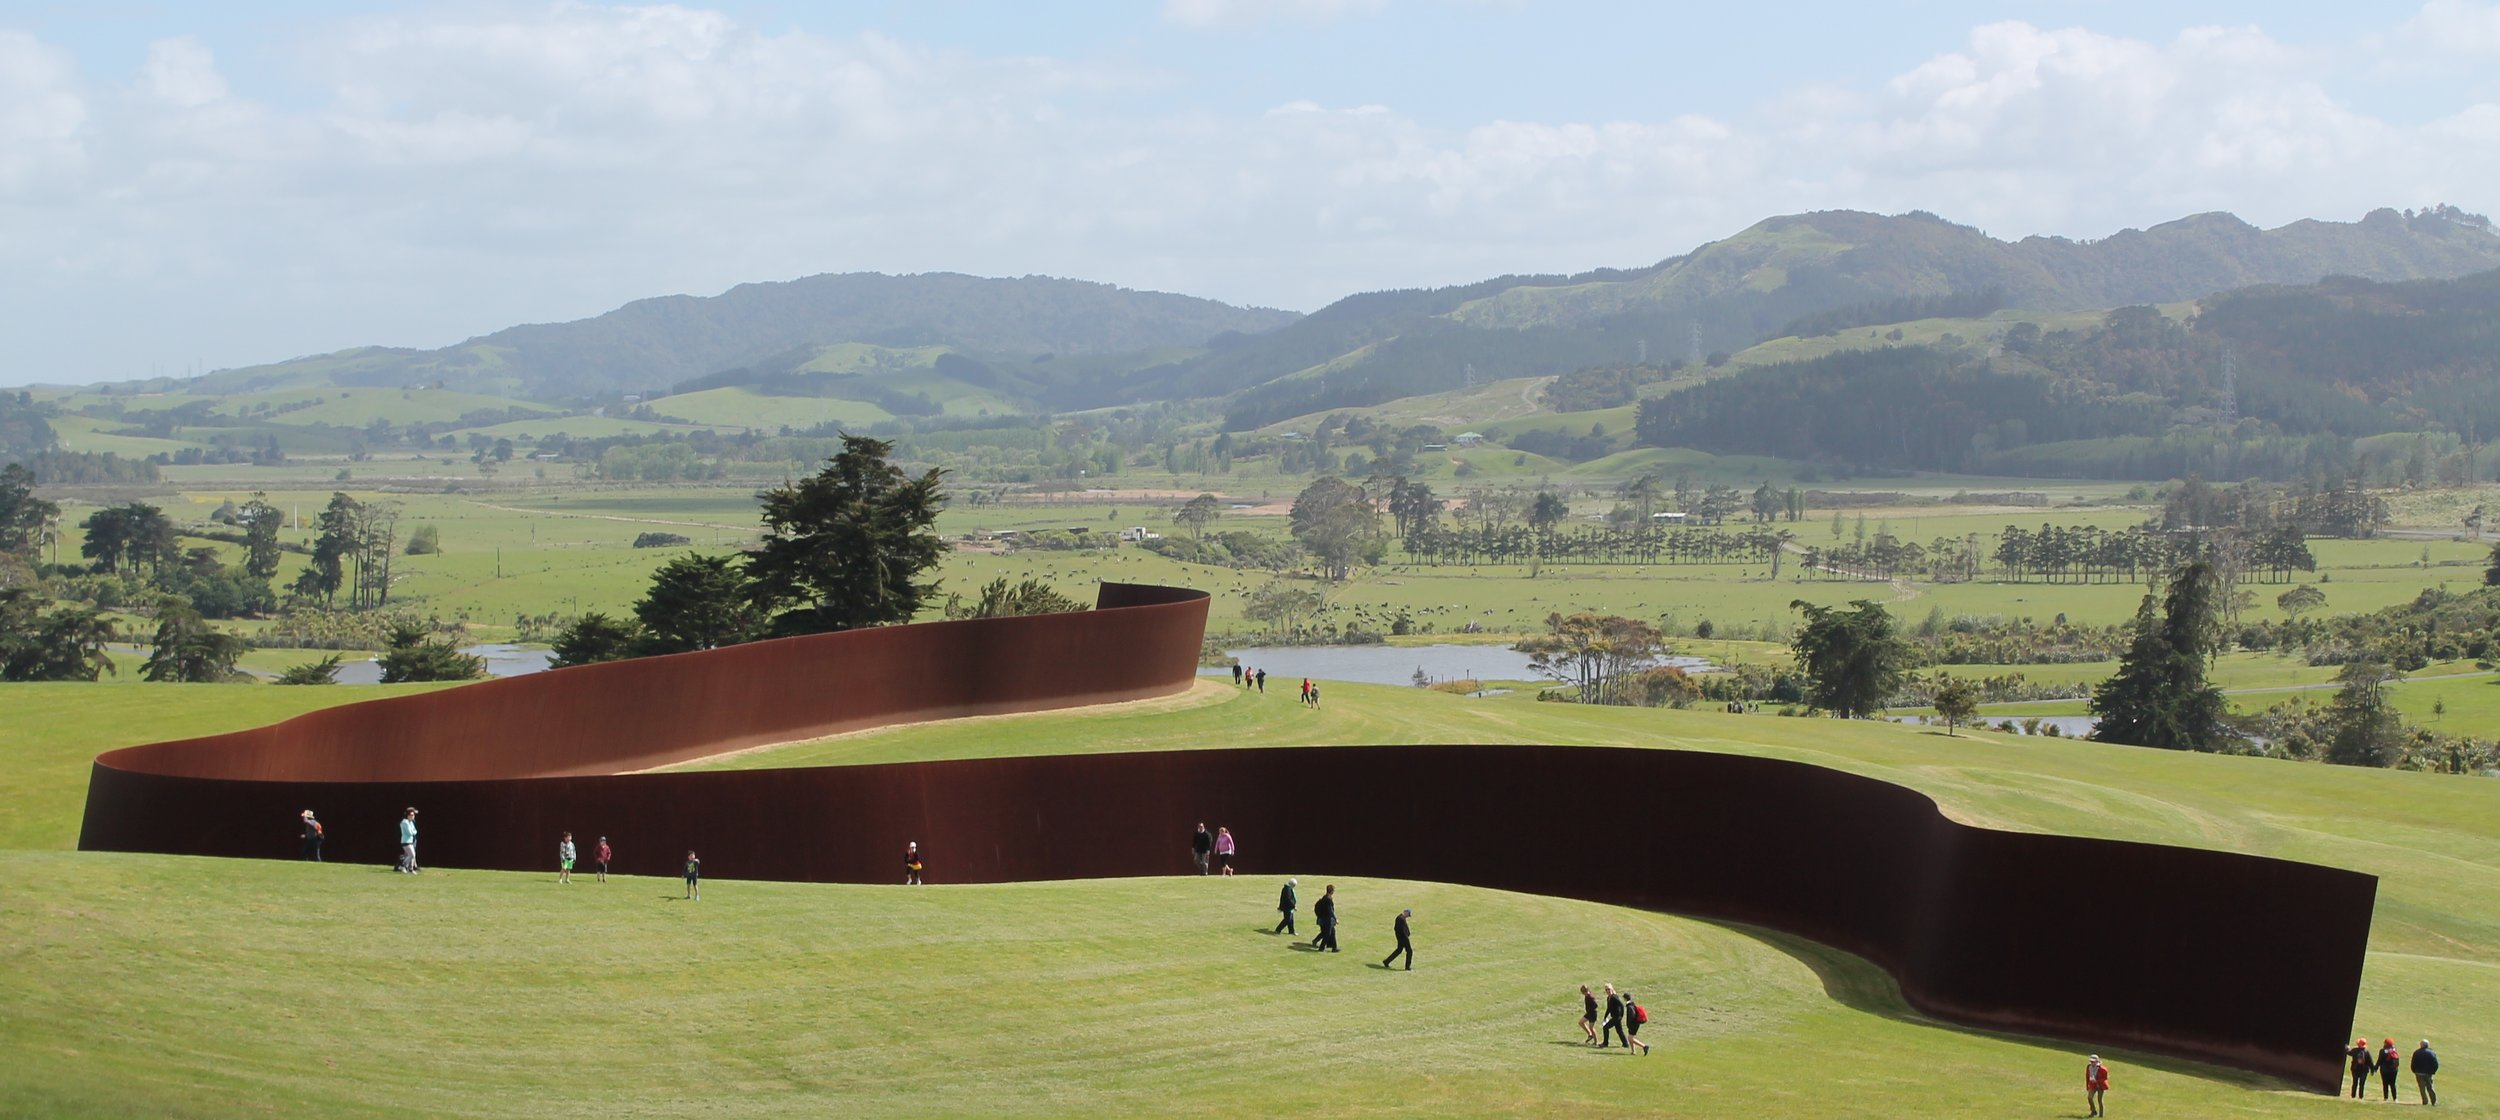 Te Tuhirangi Contour  by Richard Serra. Gibbs Farm,Kaipara Harbour, New Zealand.https://compinteractive.files.wordpress.com/2014/11/img_0304.jpg